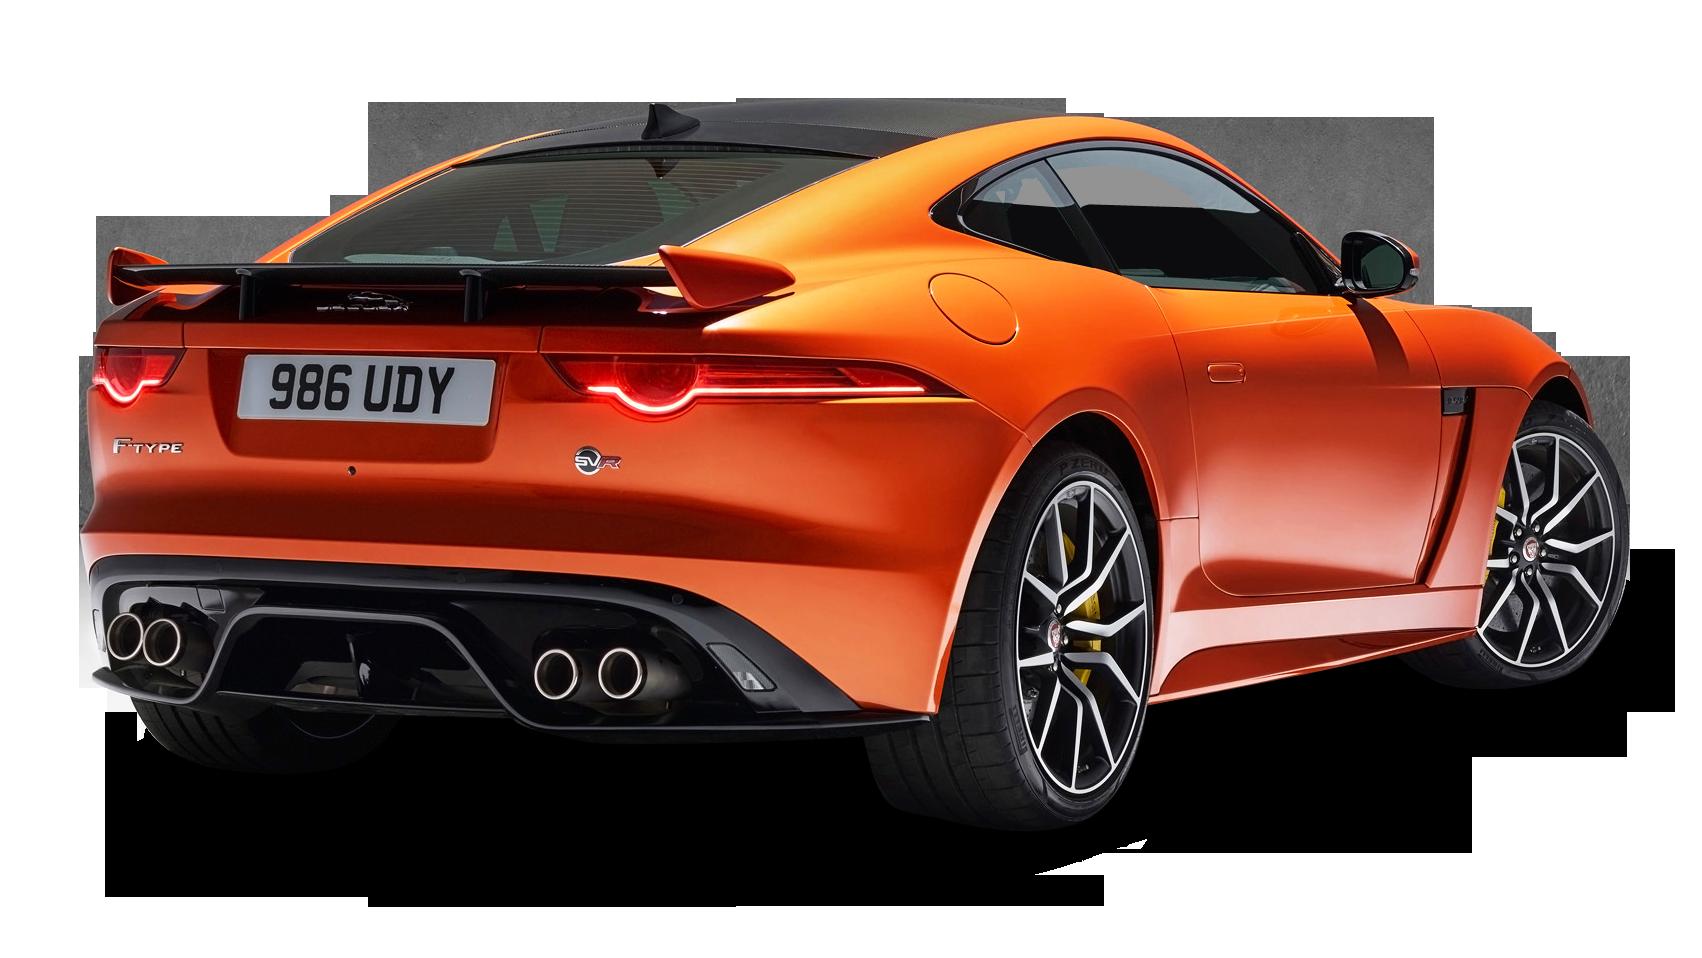 Orange Jaguar F Type Svr Coupe Back View Car Png Image Jaguar F Type Jaguar Jaguar Suv